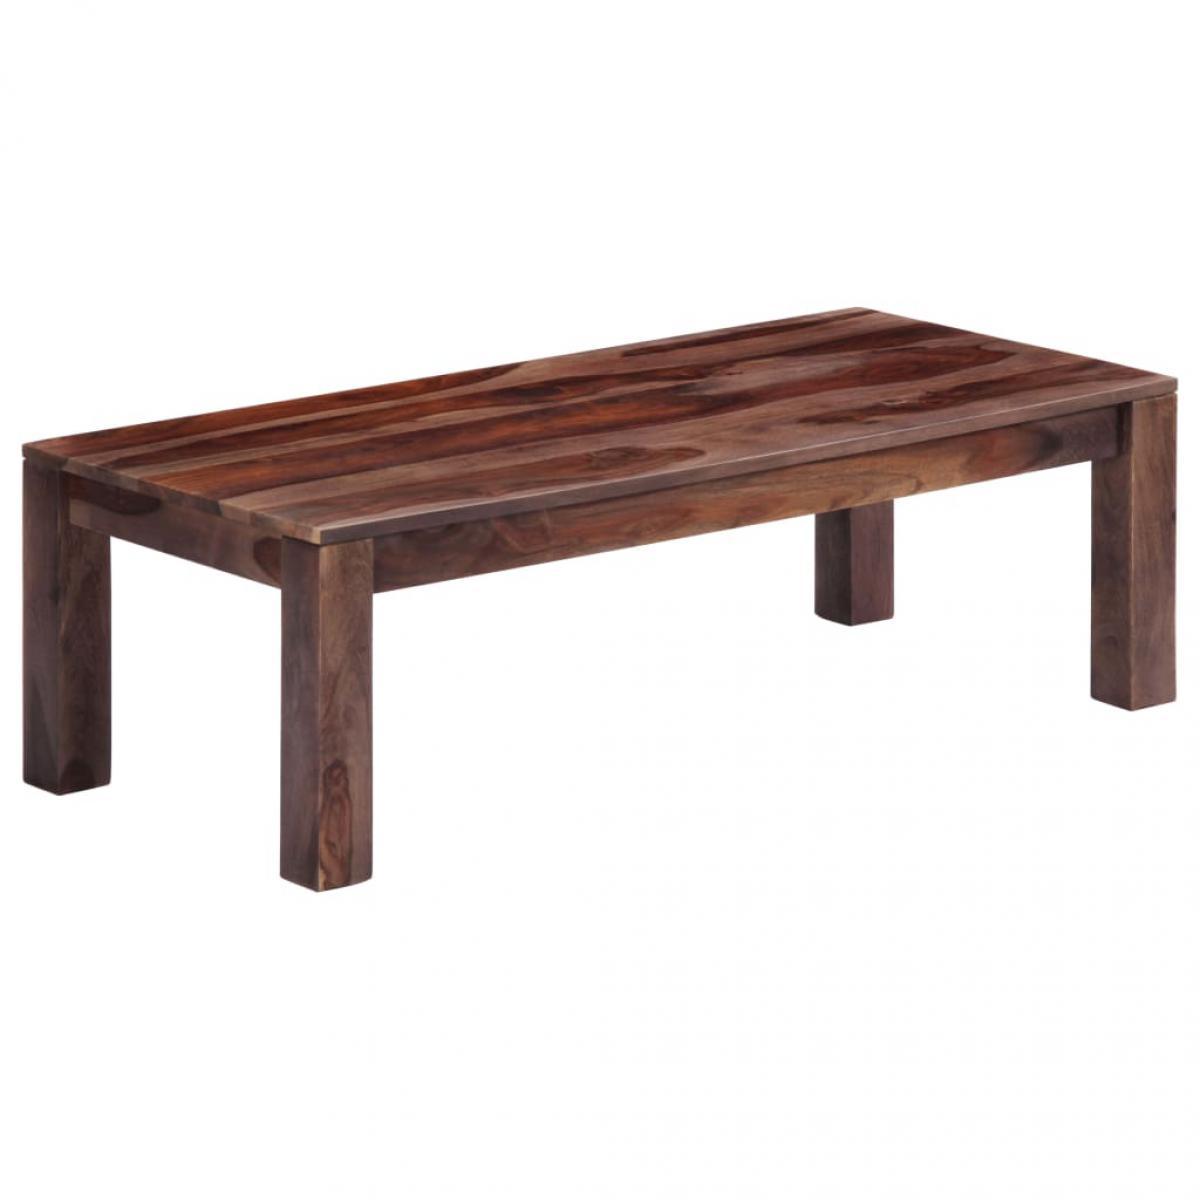 Chunhelife Table basse Gris 110 x 50 x 35 cm Bois de Sesham massif